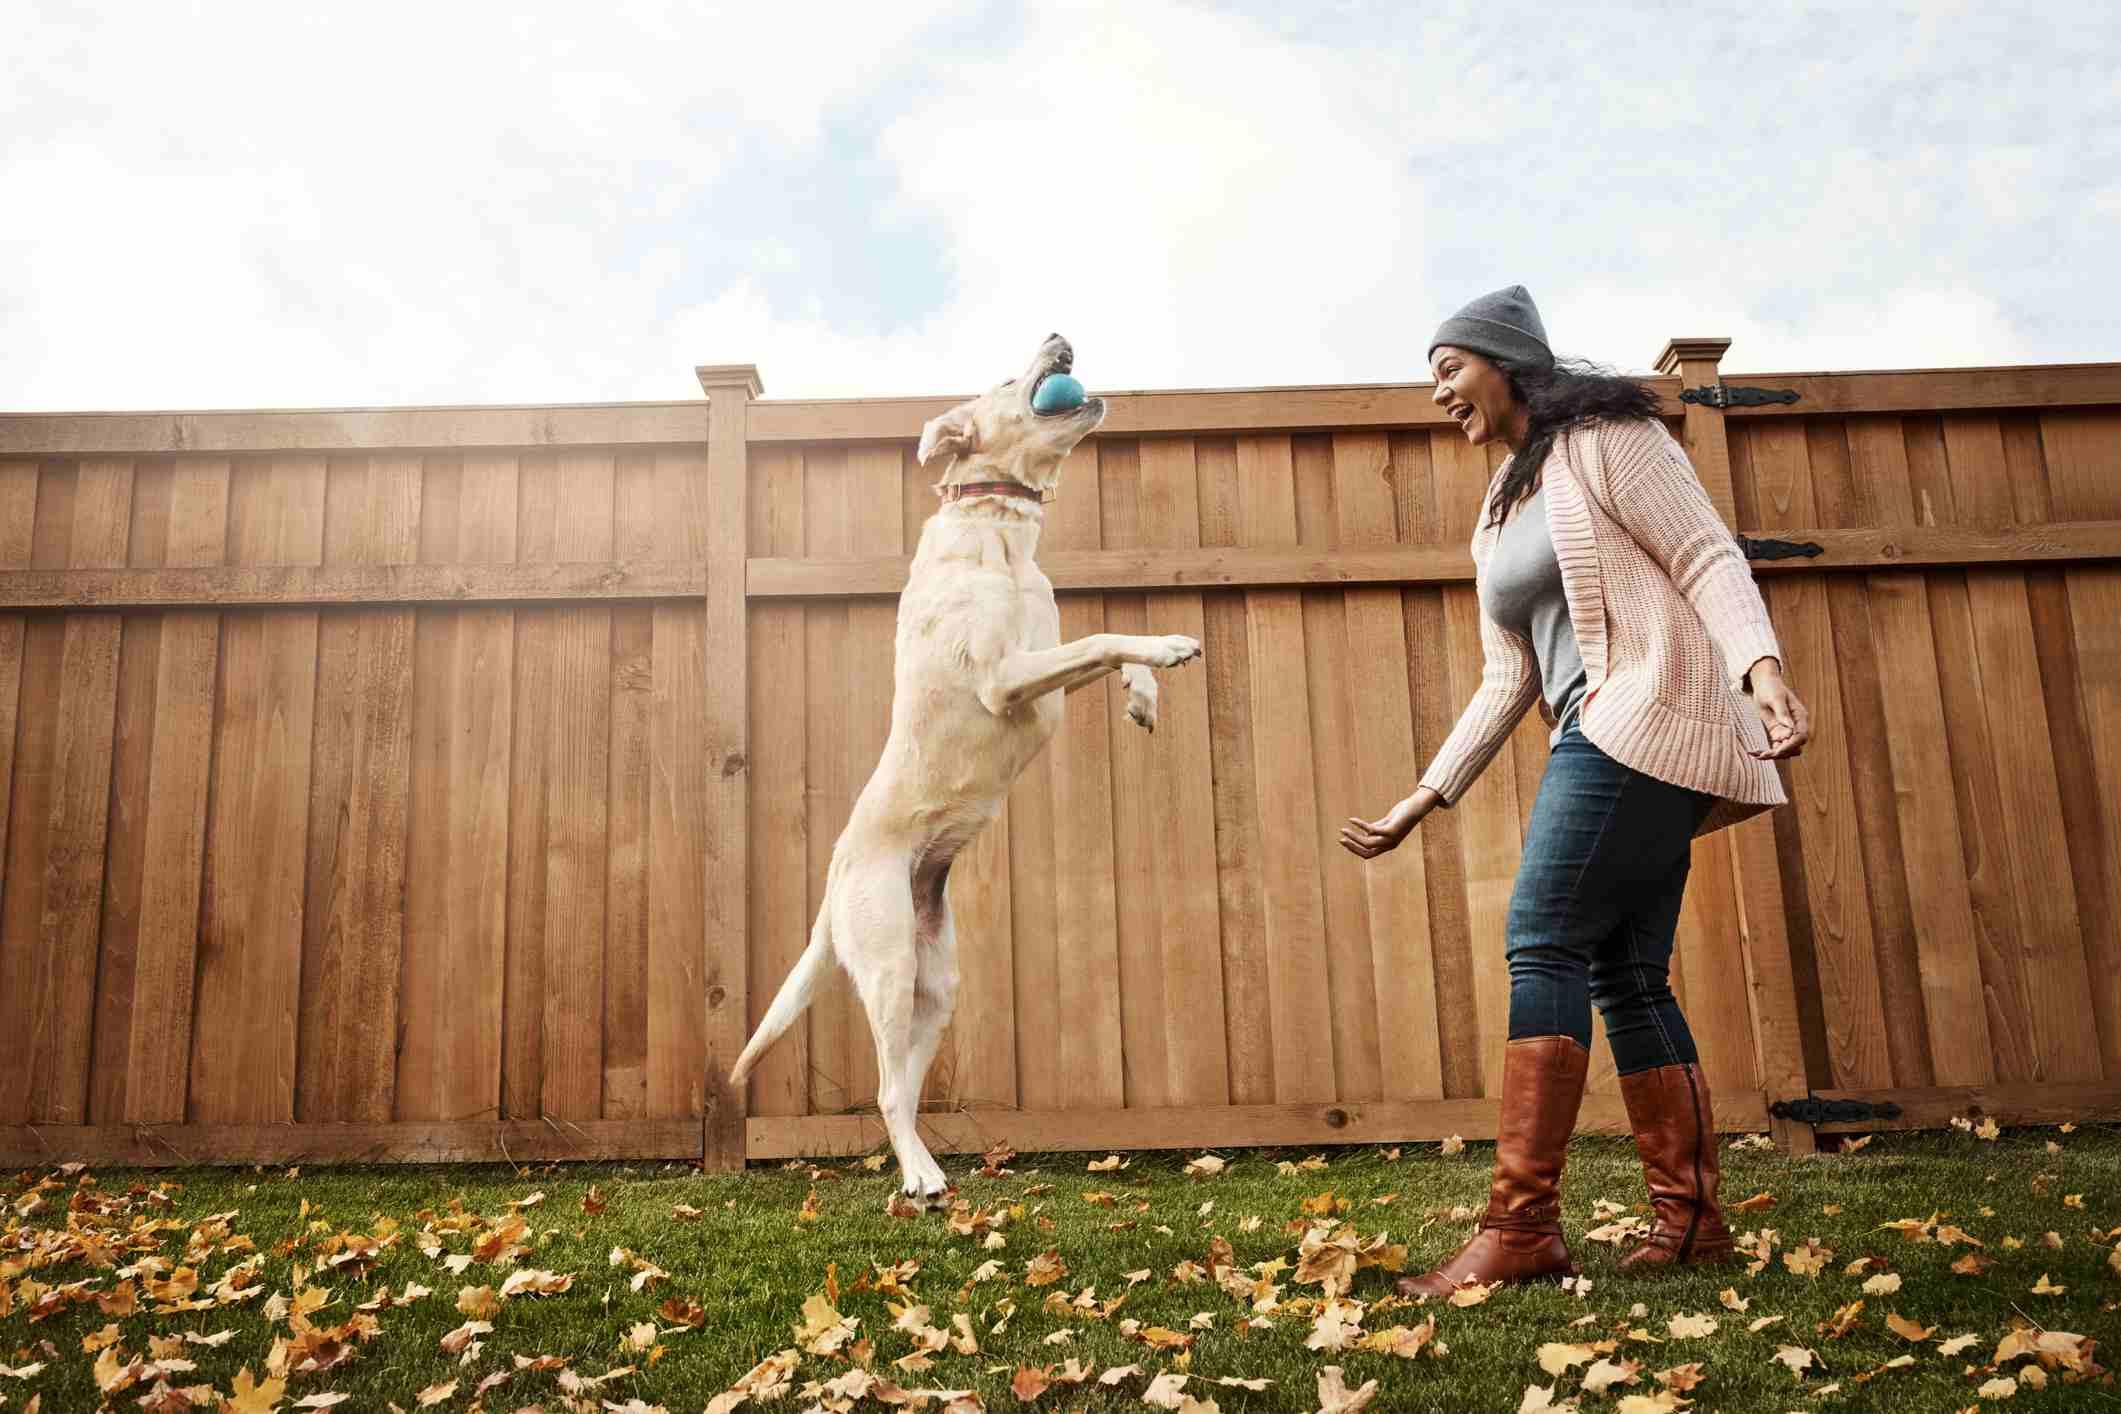 Dog playing fetch outside